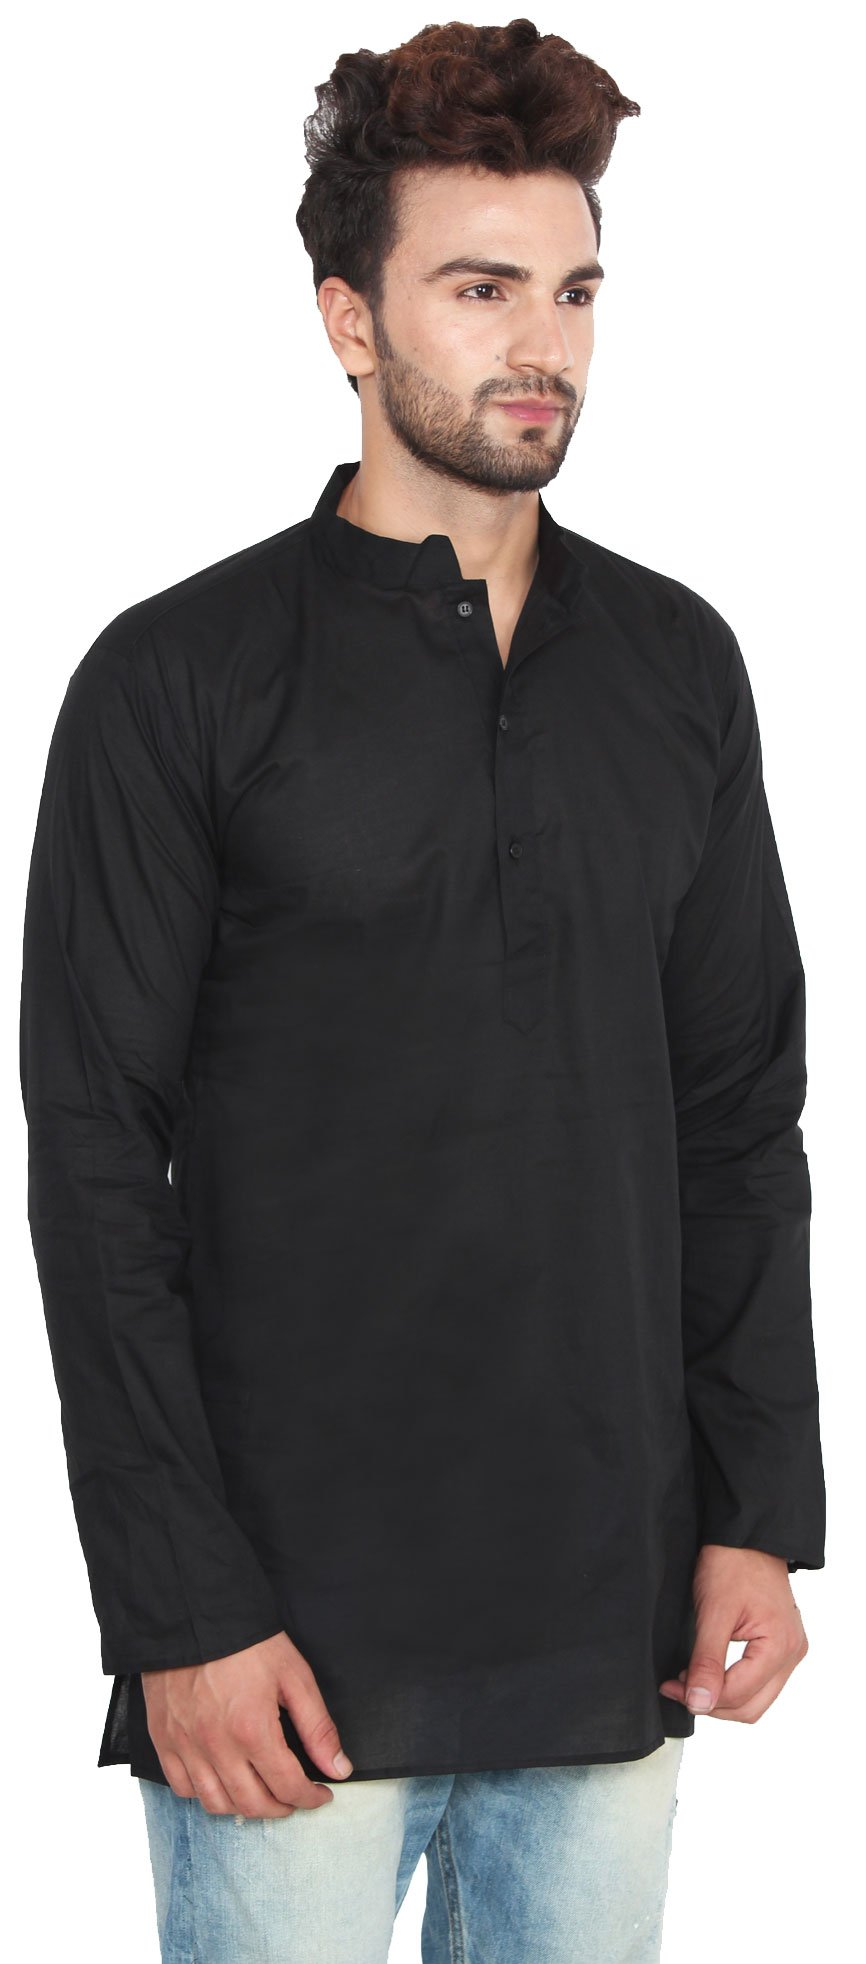 Cotton Dress Mens Short Kurta Shirt India Fashion Clothes (Black, M) by Maple Clothing (Image #3)